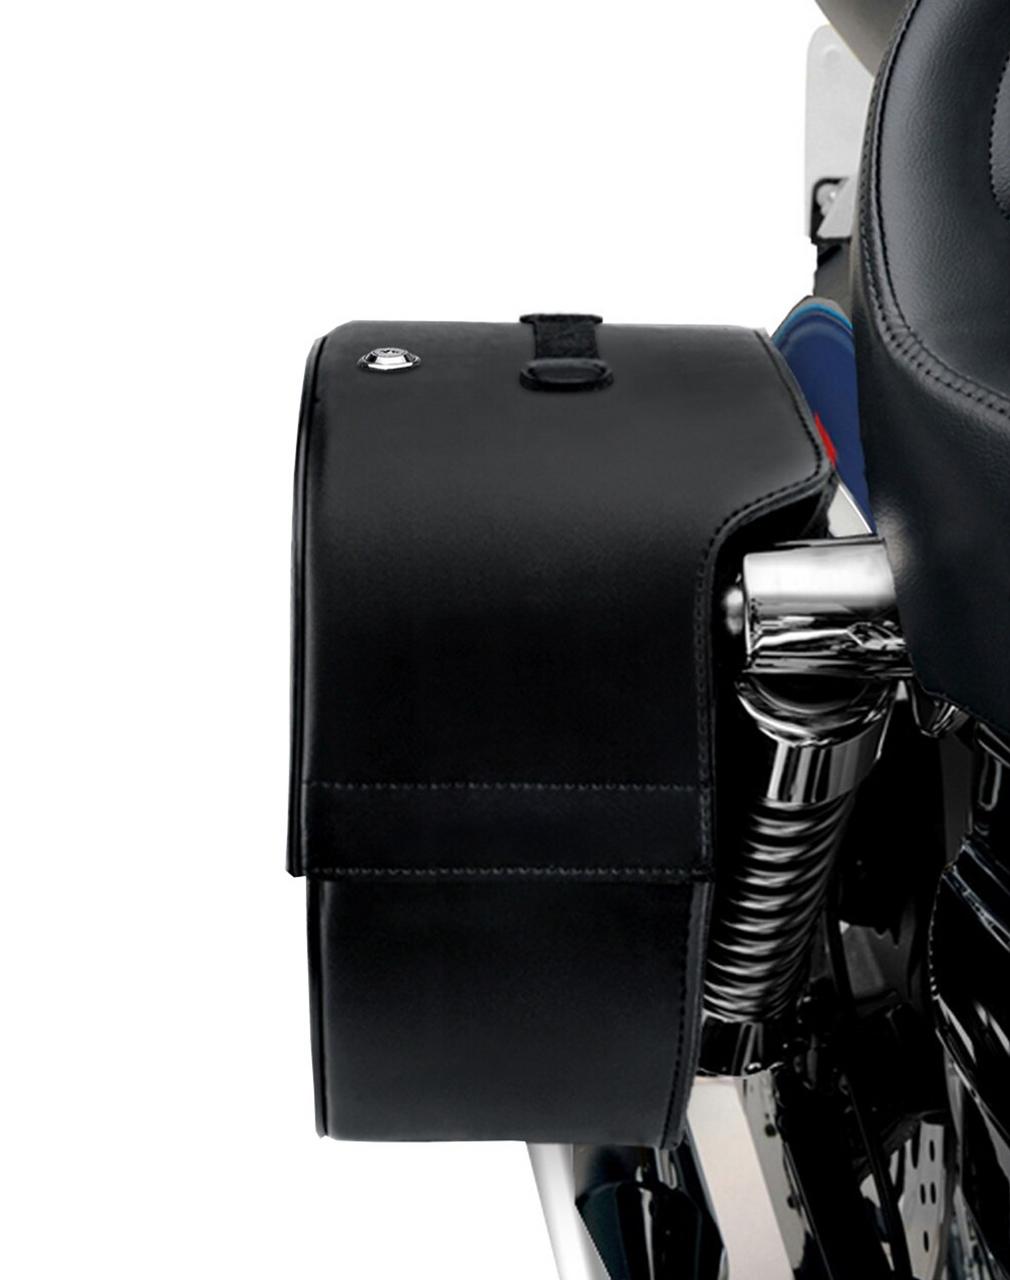 Kawasaki Vulcan 750 Armor Shock Cutout Studded Large Motorcycle Saddlebags shock cutout view